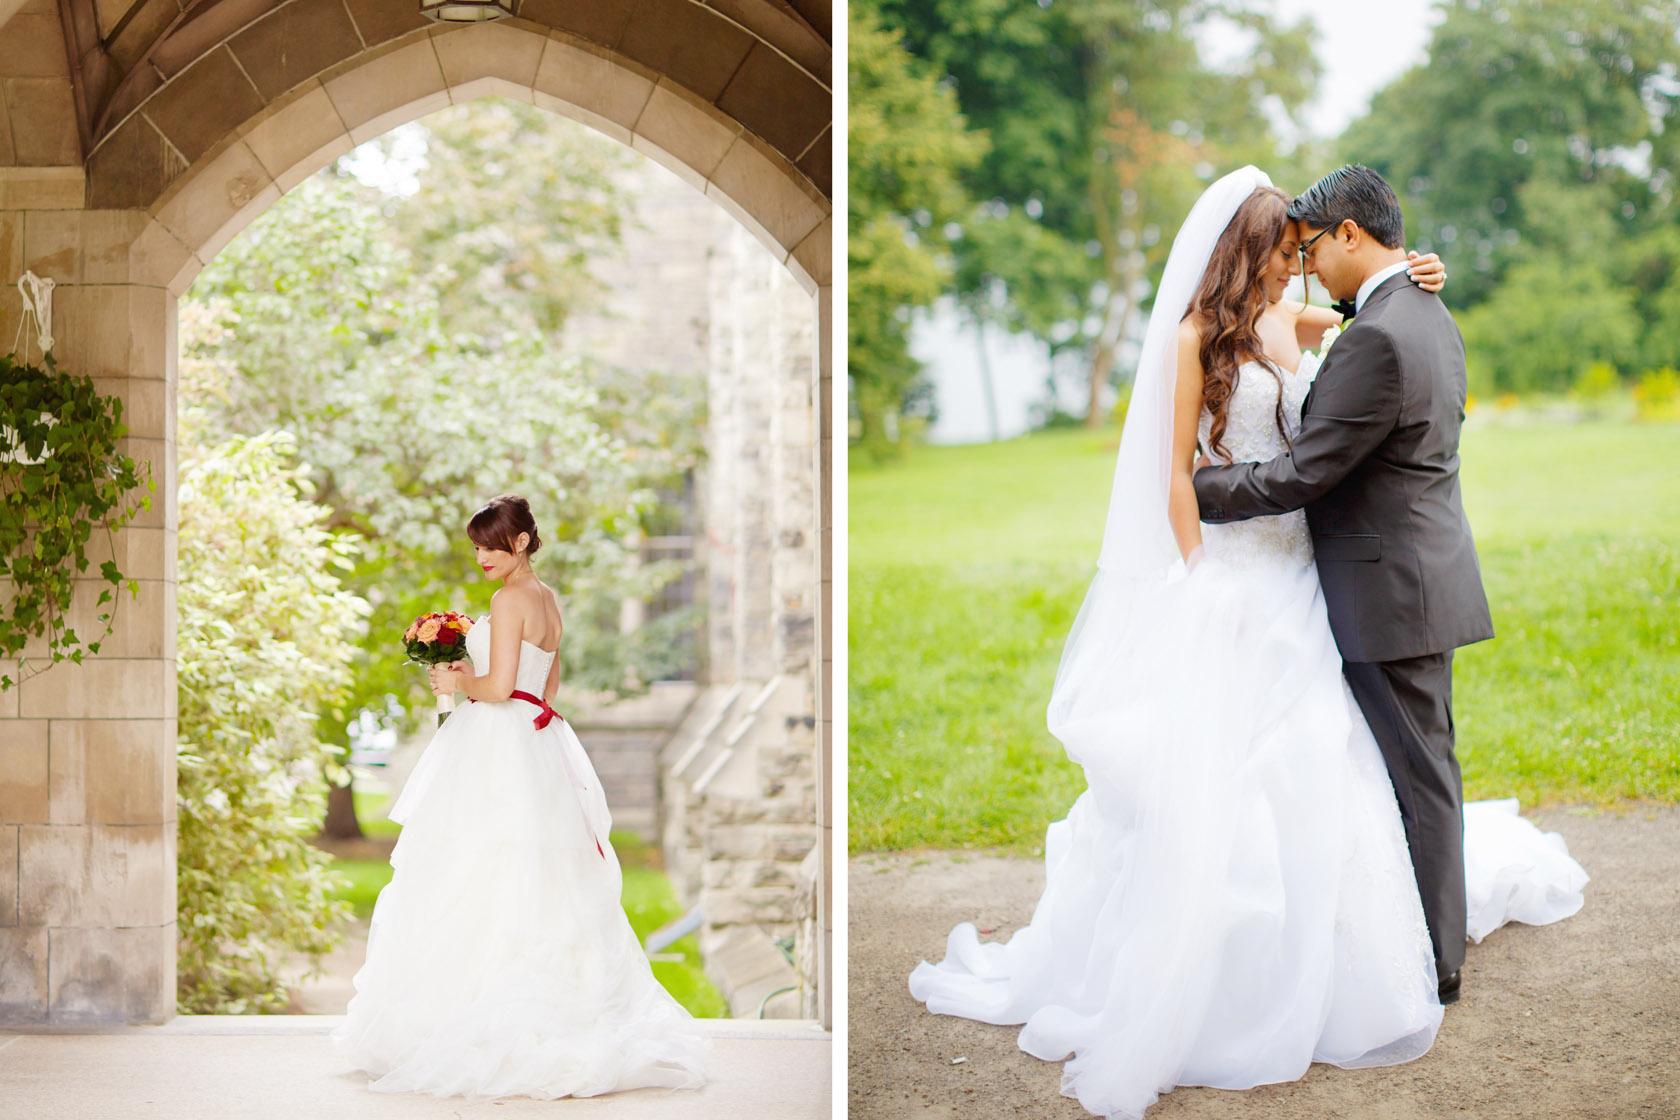 stephen sager photography 2133 toronto wedding photography